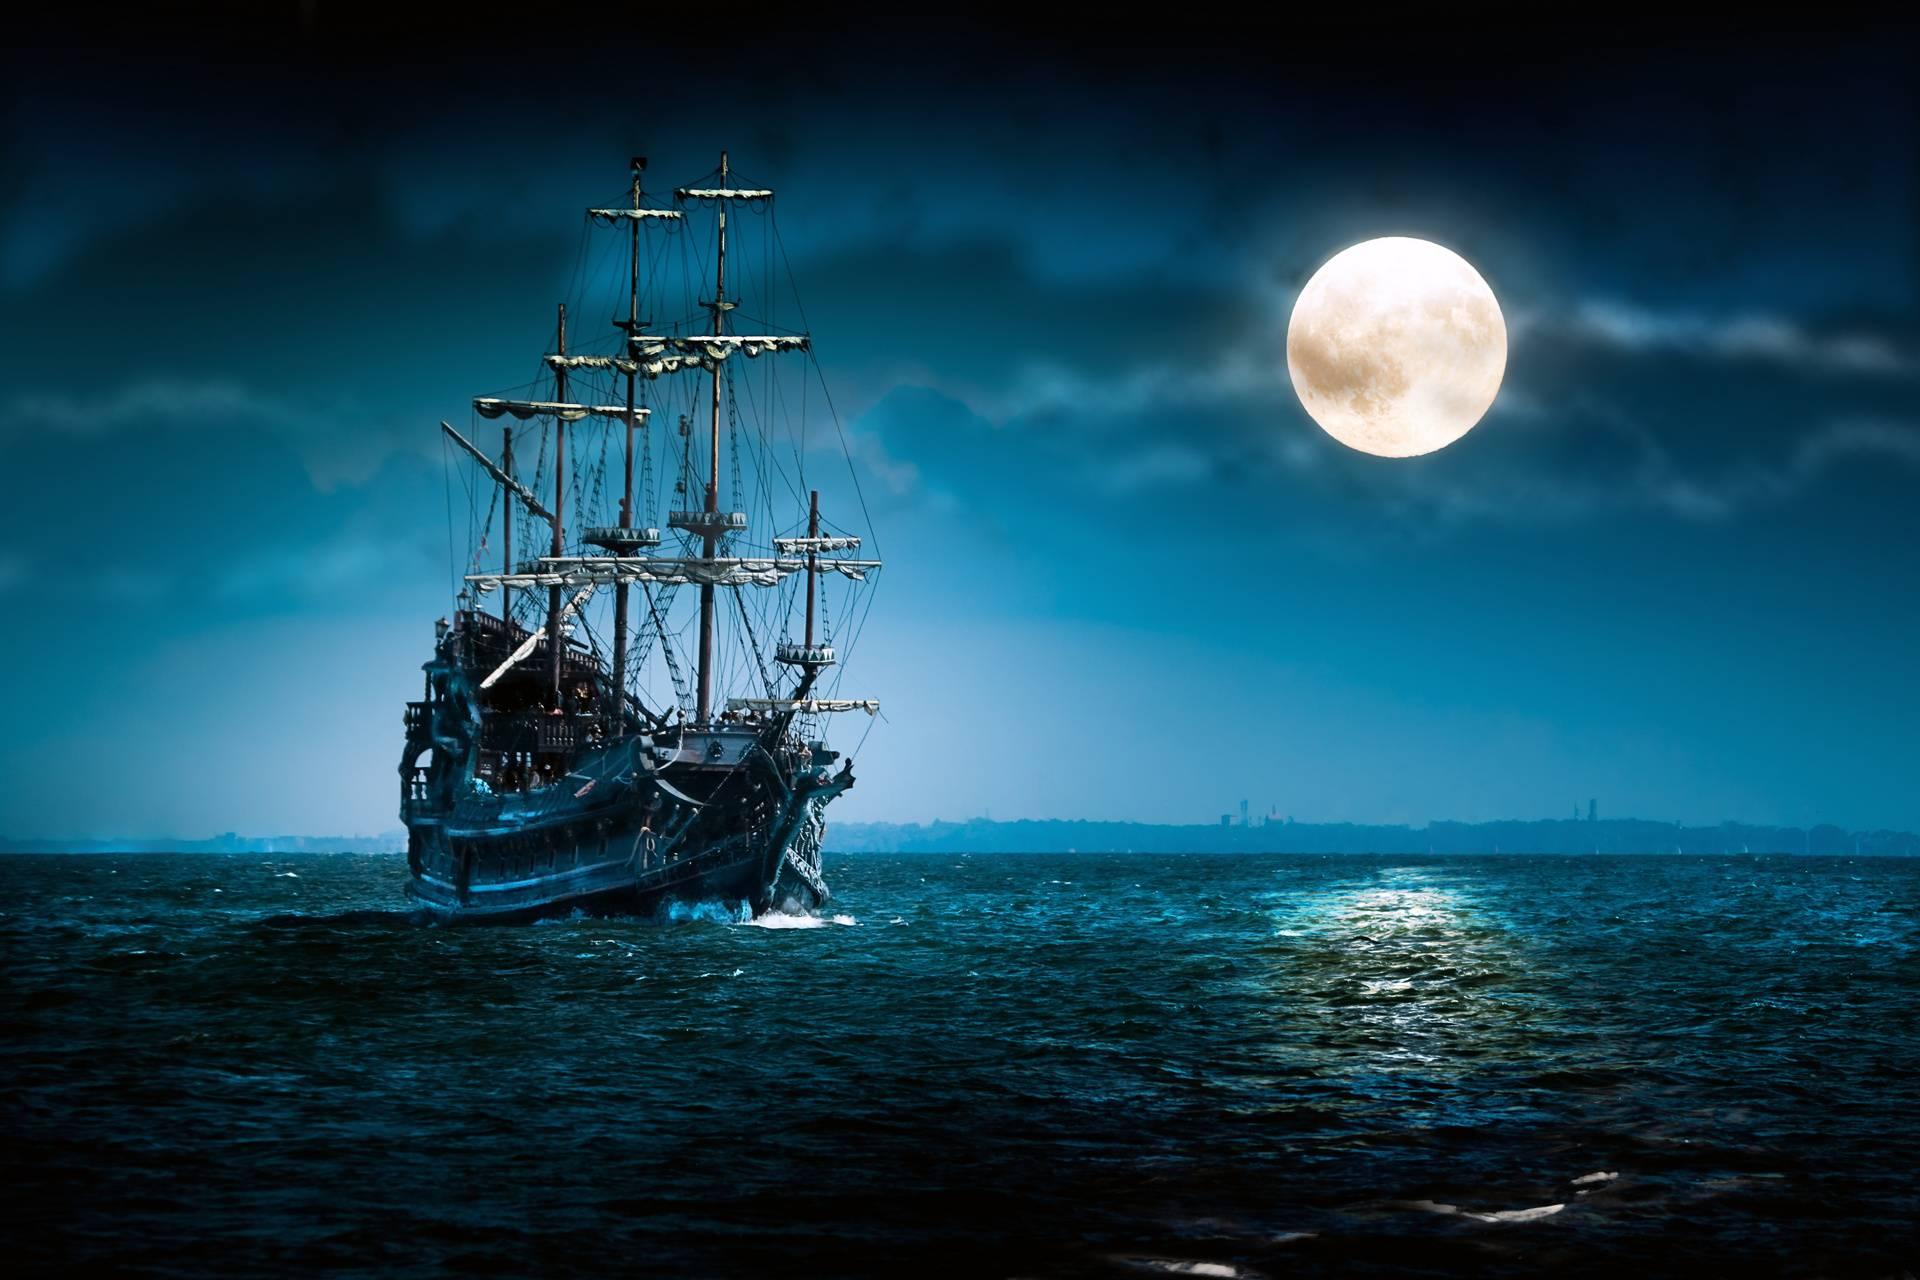 night in ocean